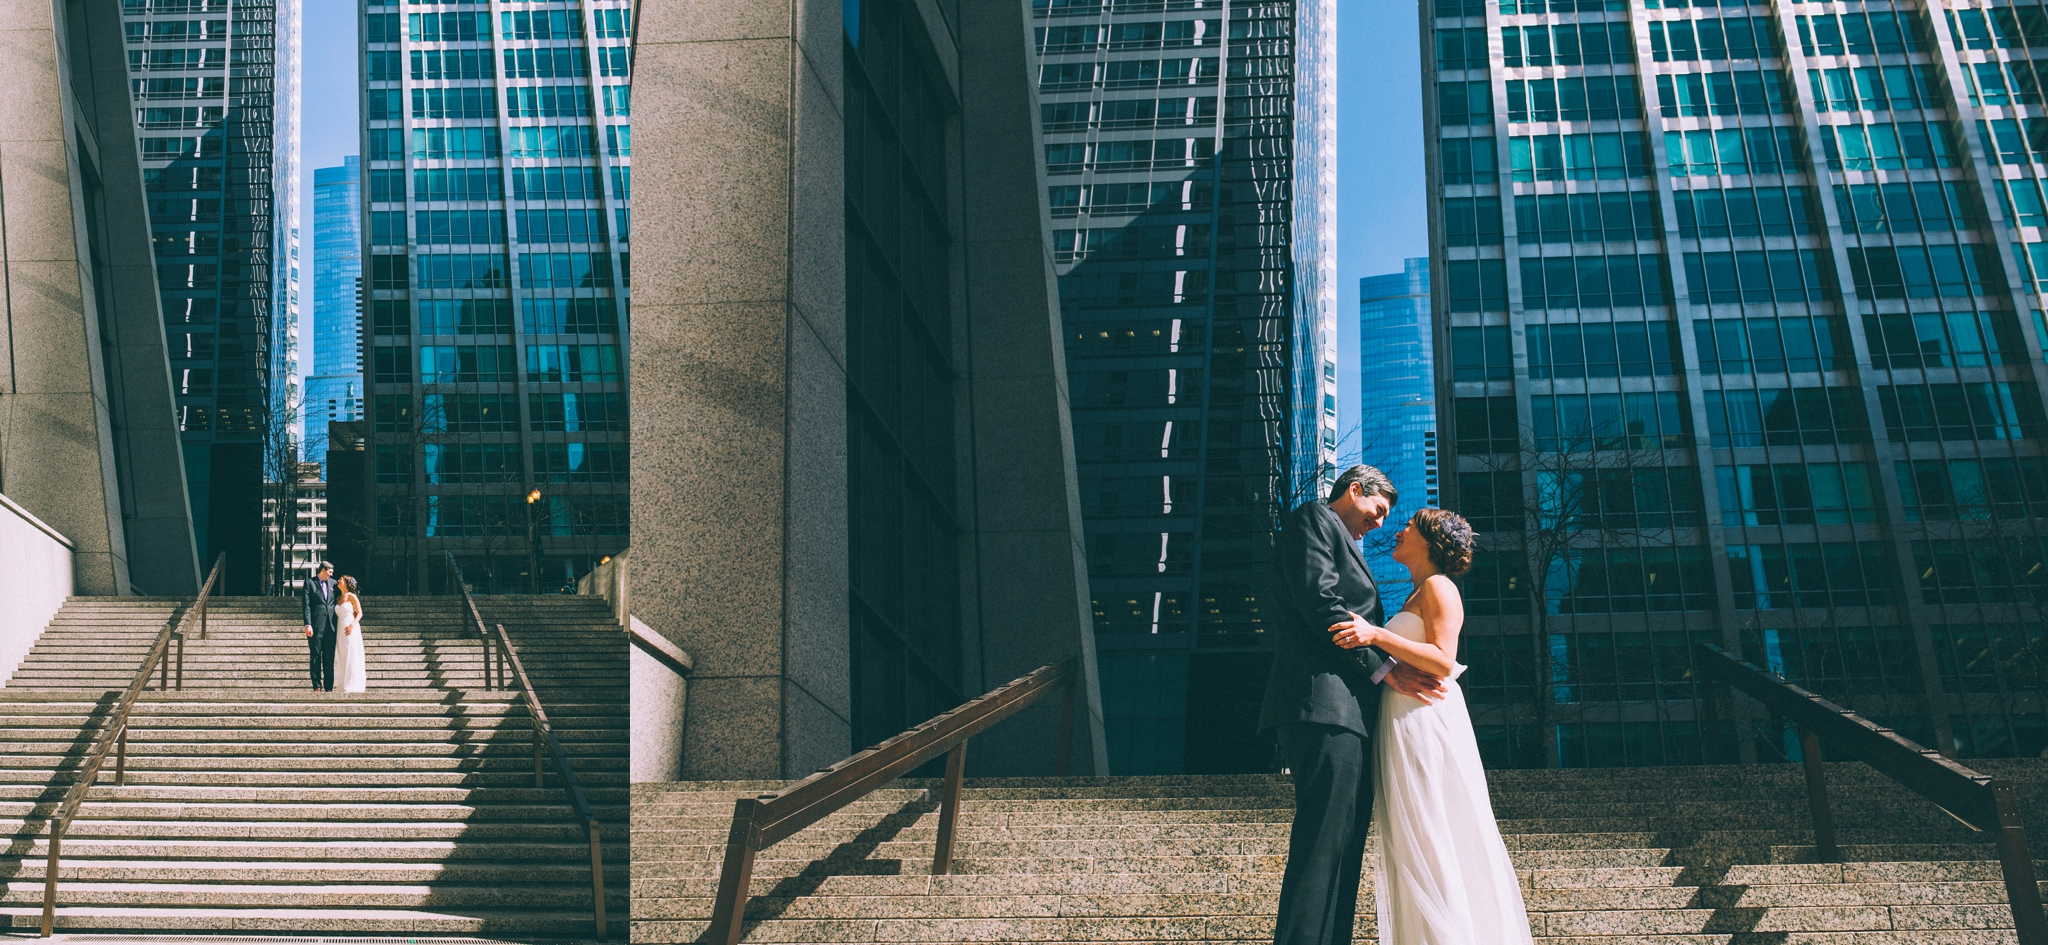 Improv-Olympic-Wedding-Photography-032.JPG